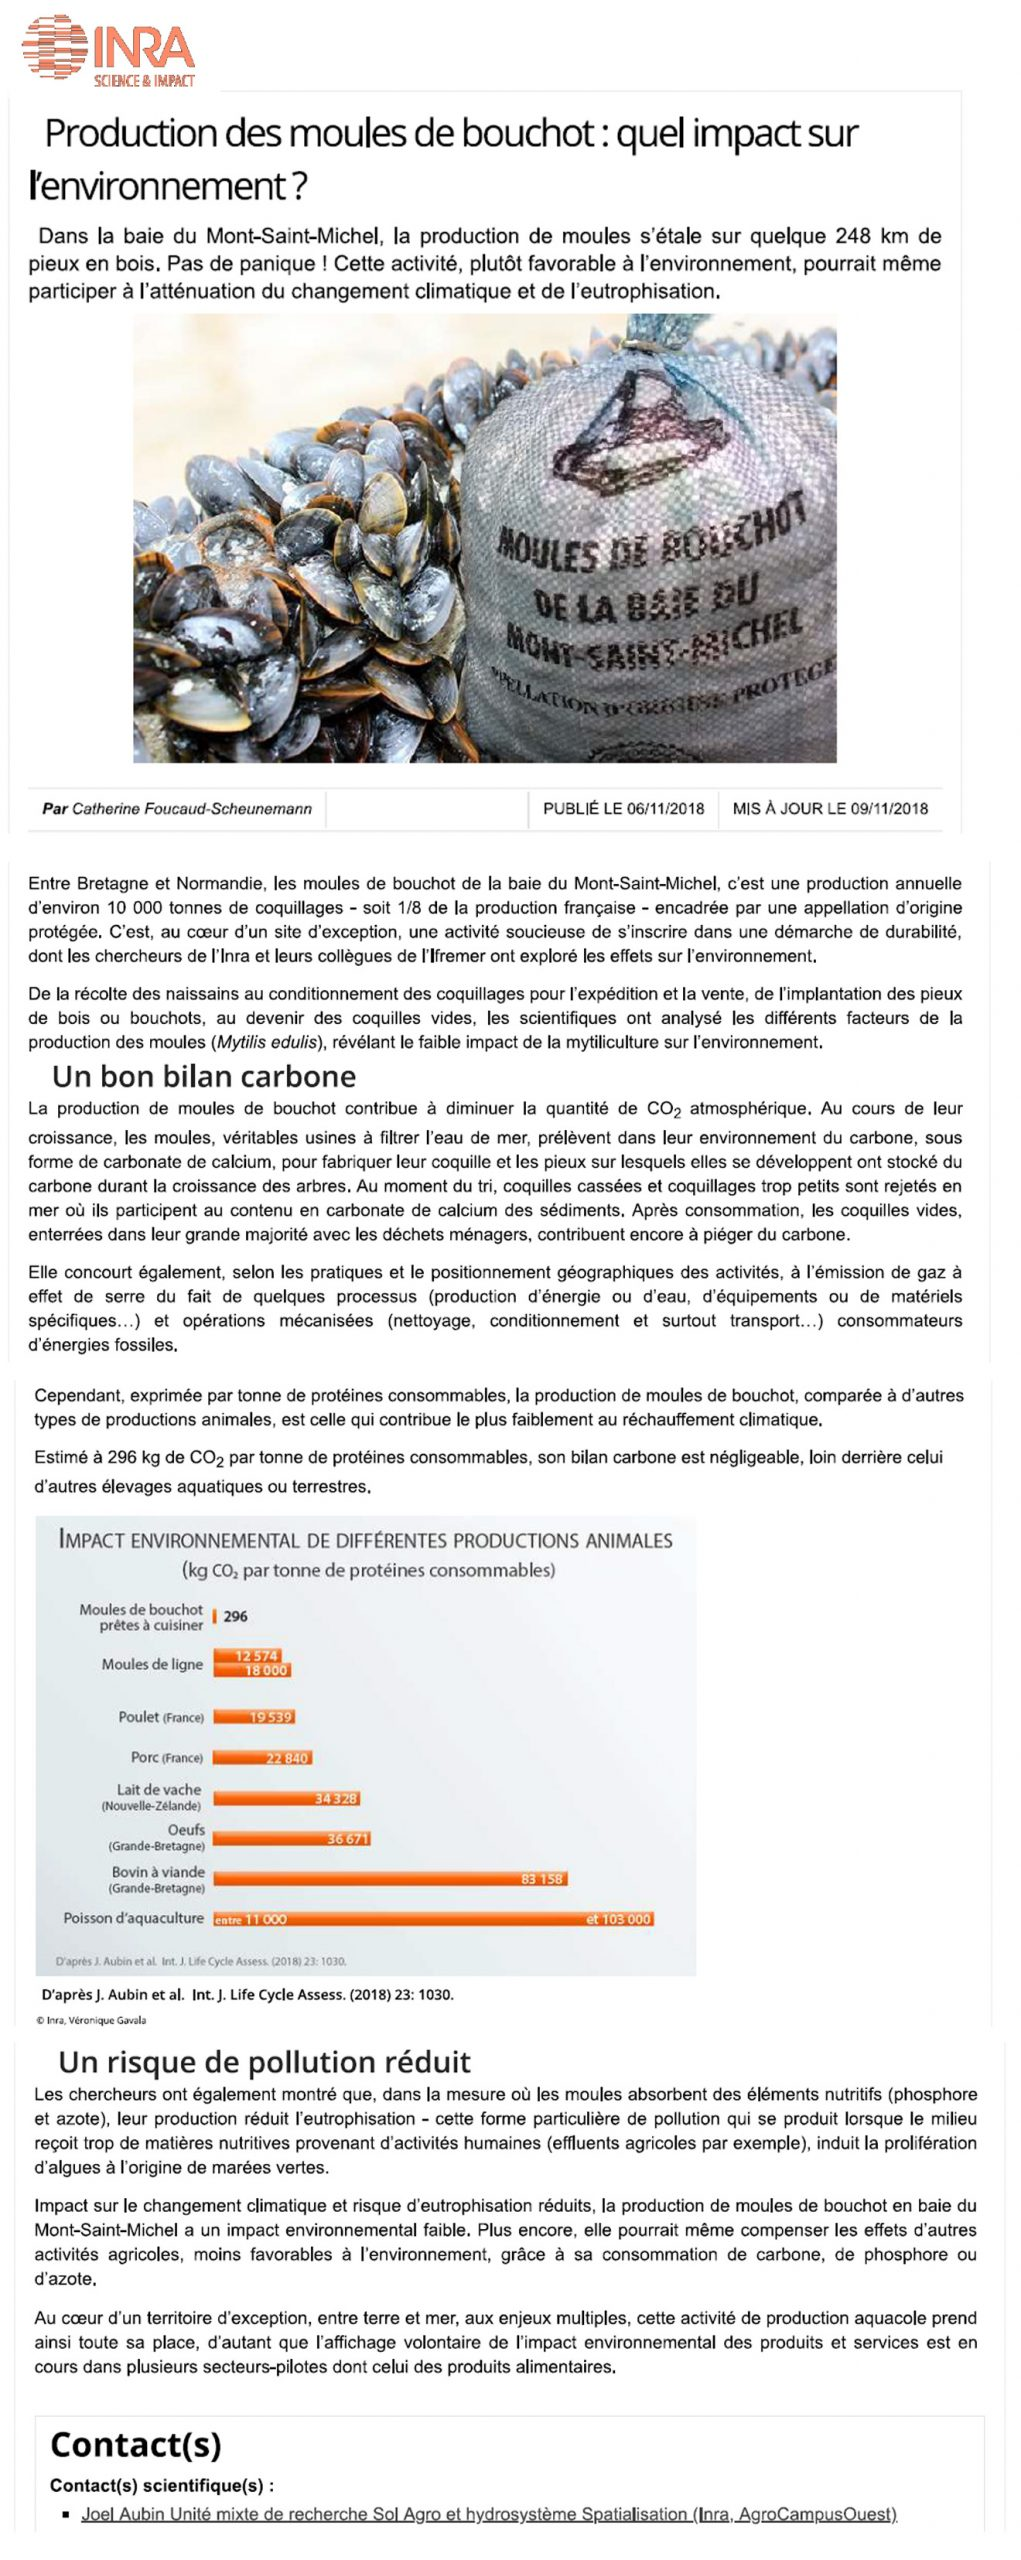 2018 11 06 Impact Environnemental Article site INRA site